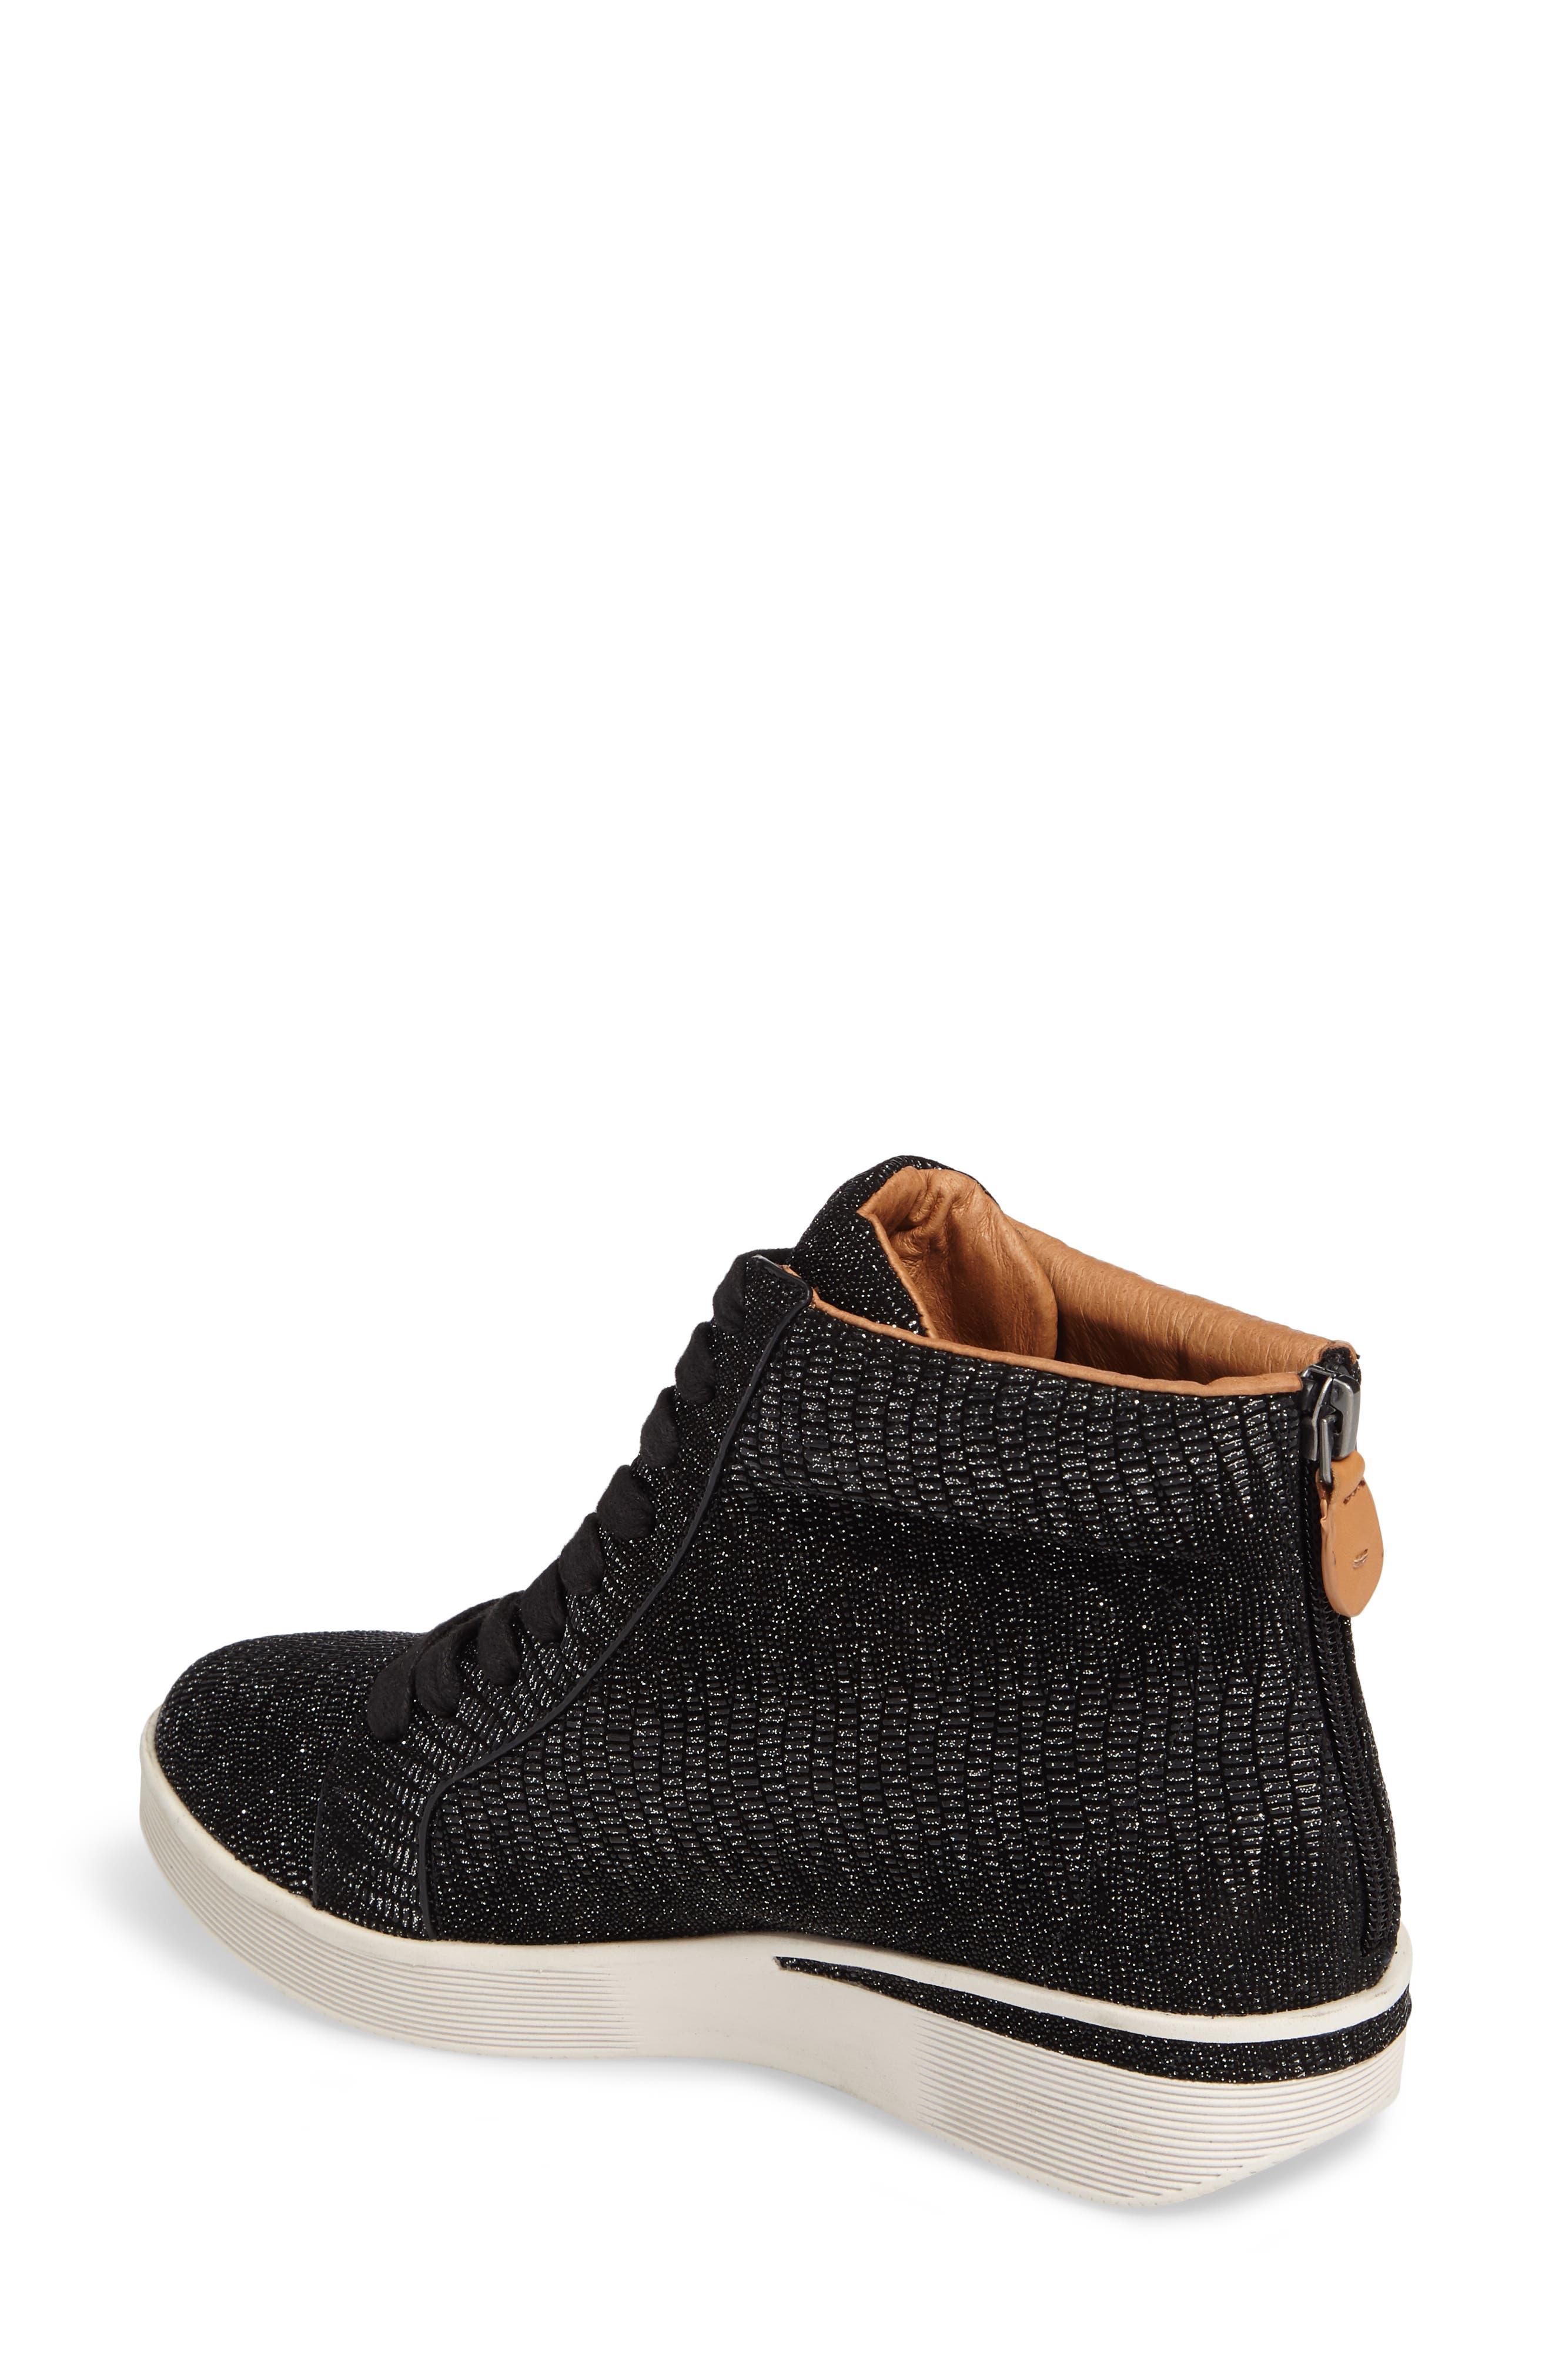 Helka High Top Sneaker,                             Alternate thumbnail 2, color,                             Black Metallic Leather